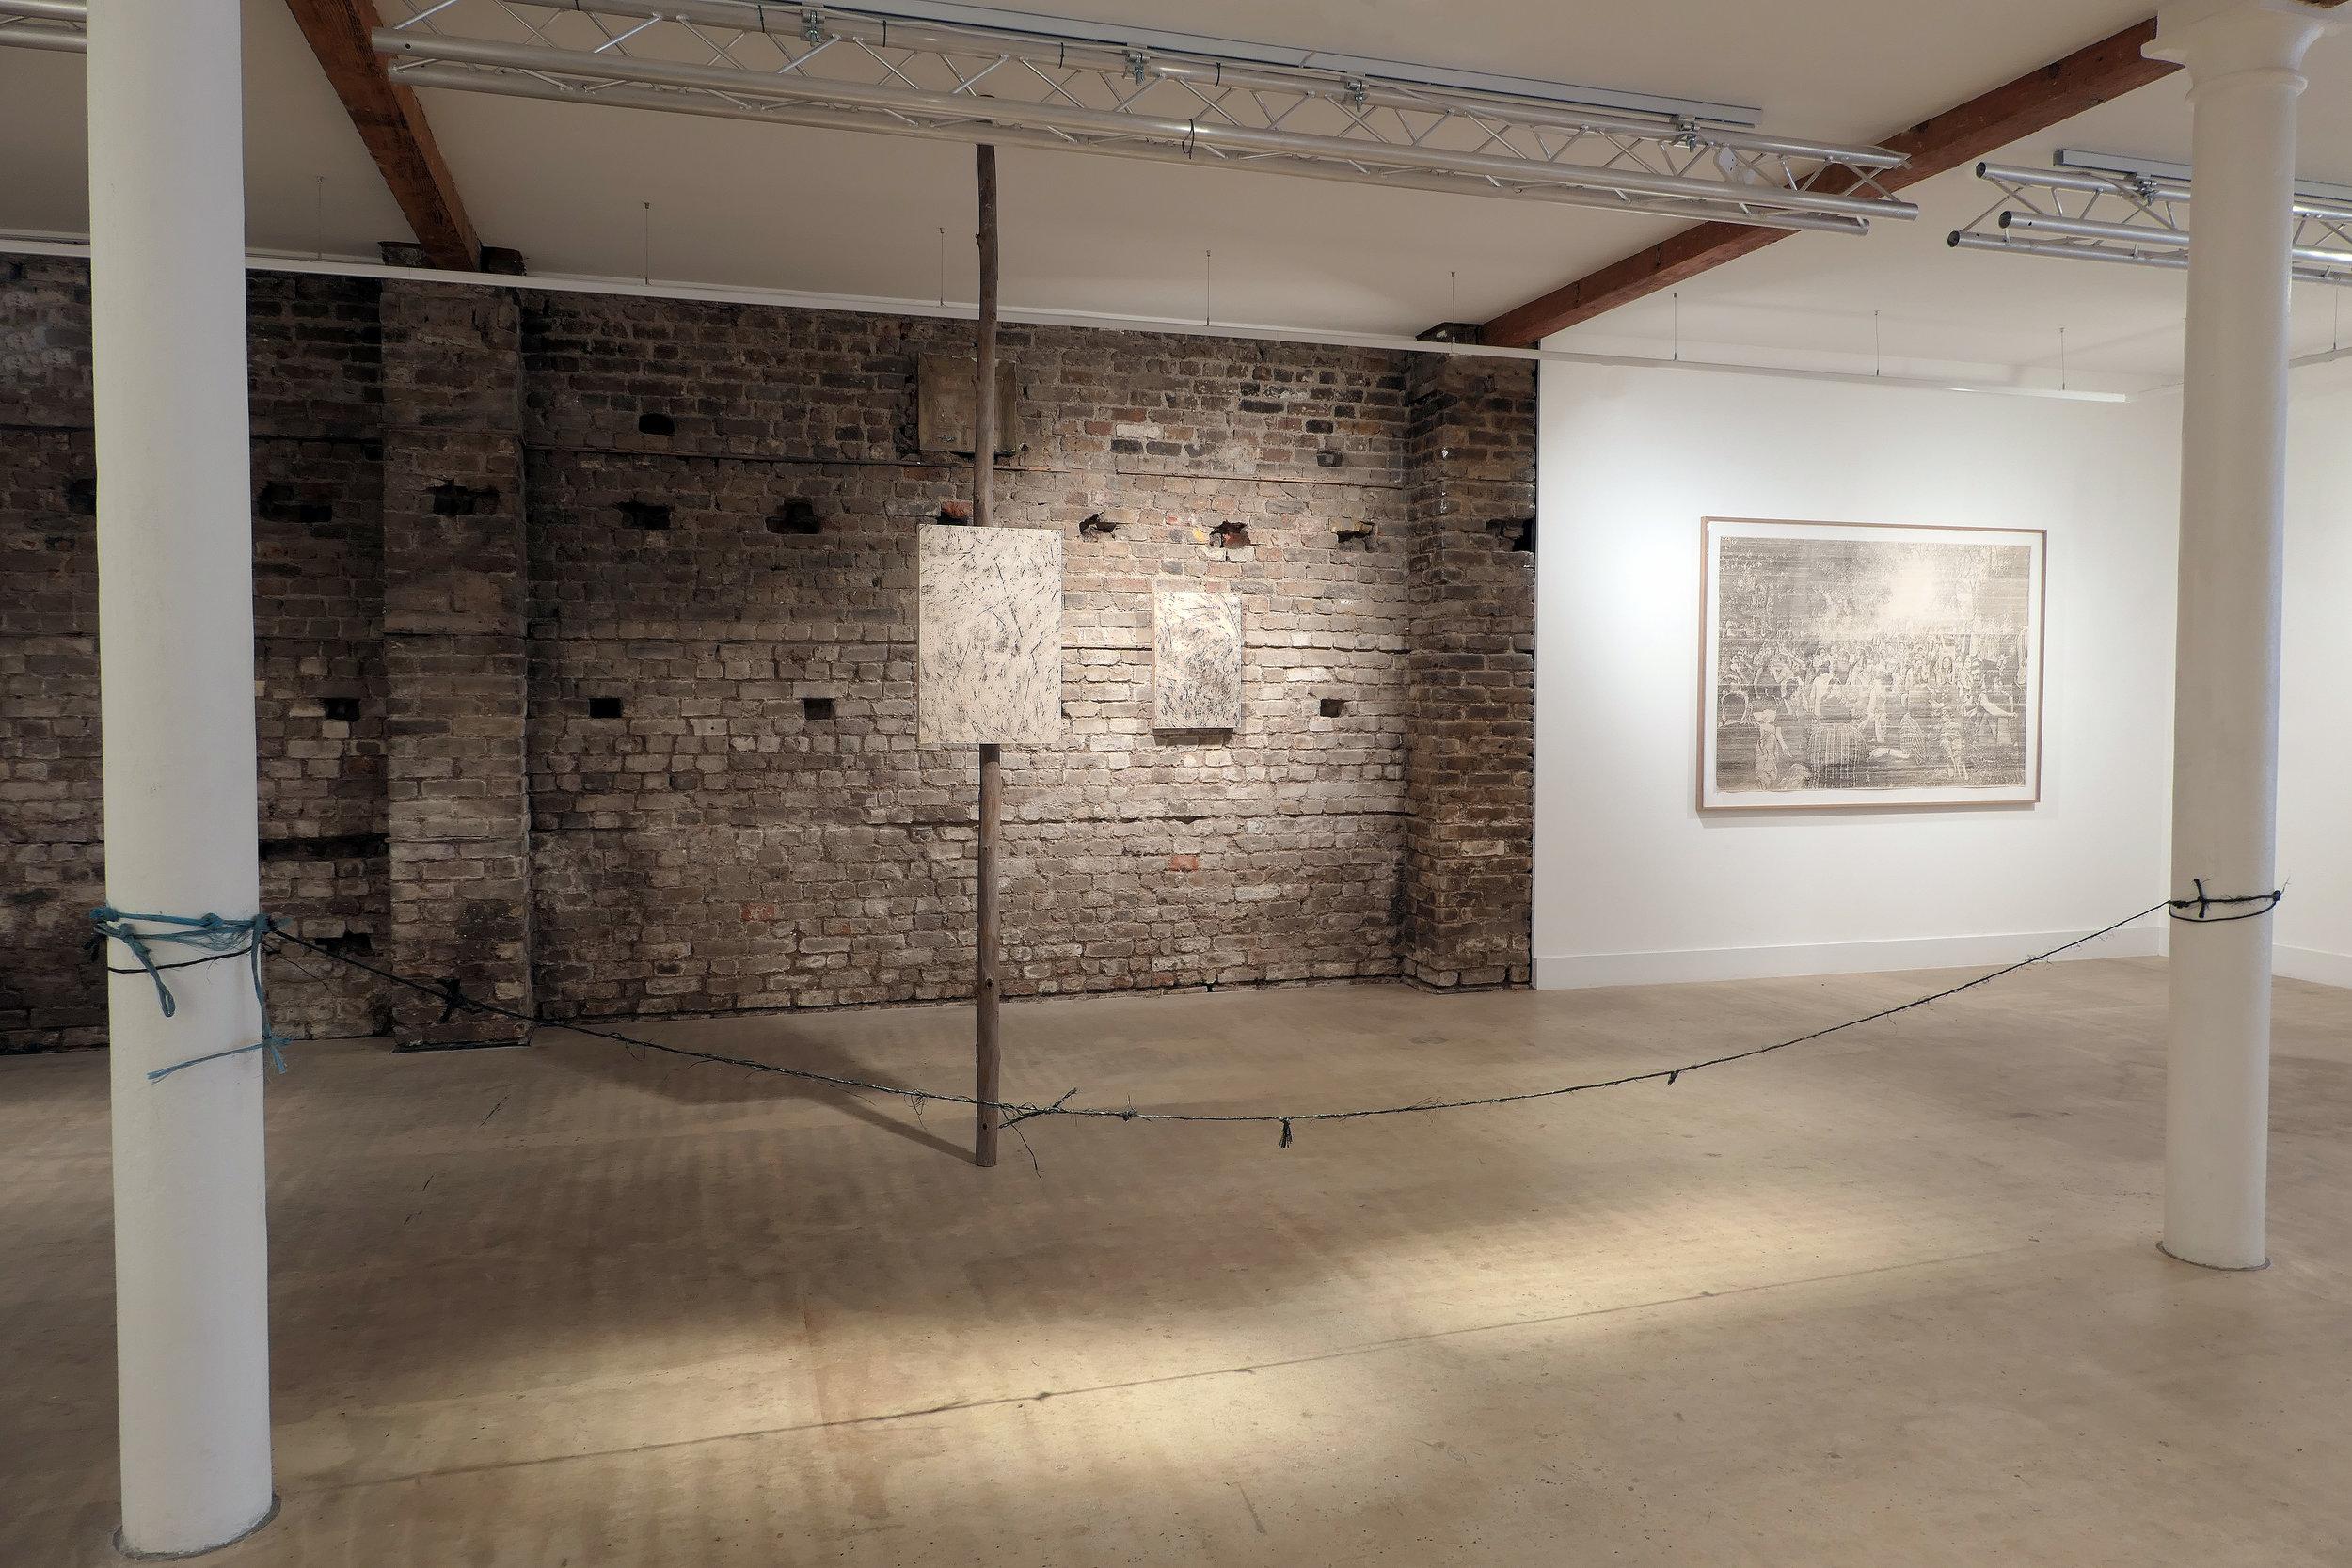 Map of the Mould | Javier Arce at No 20 Arts